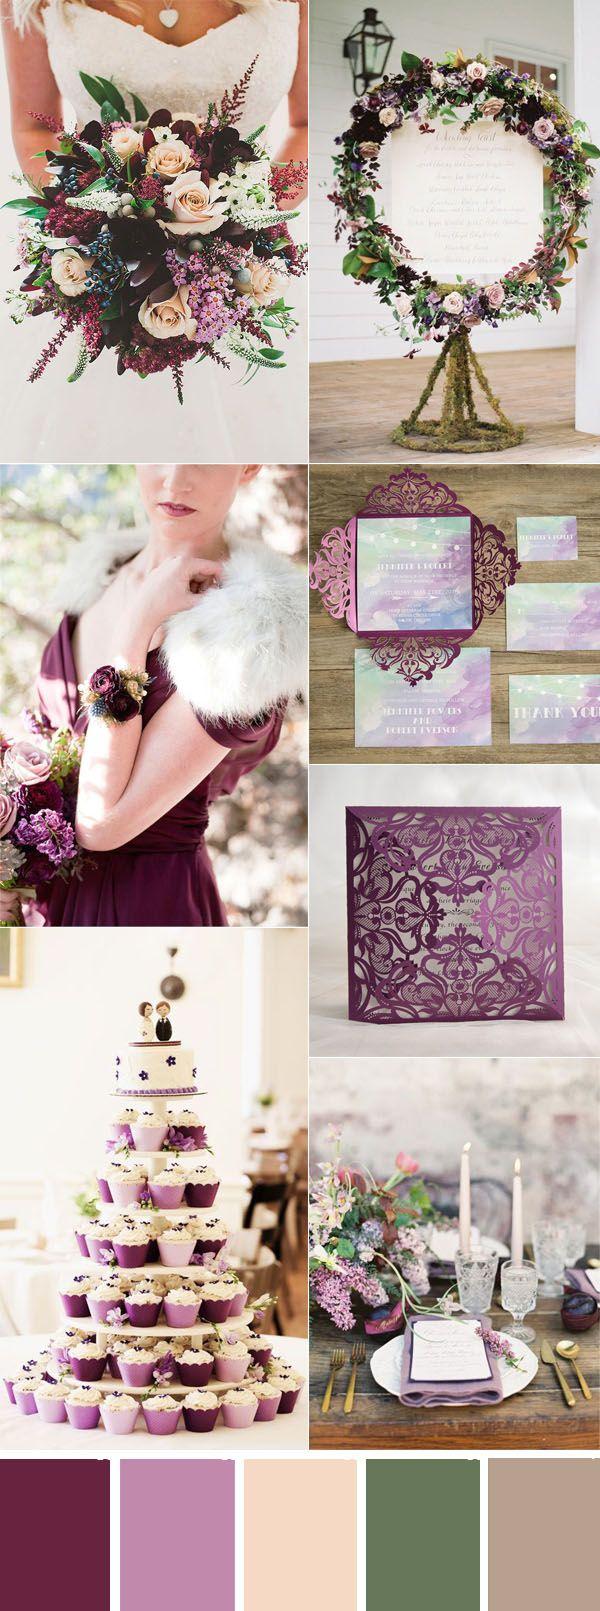 plum purple and blush fall wedding color ideas